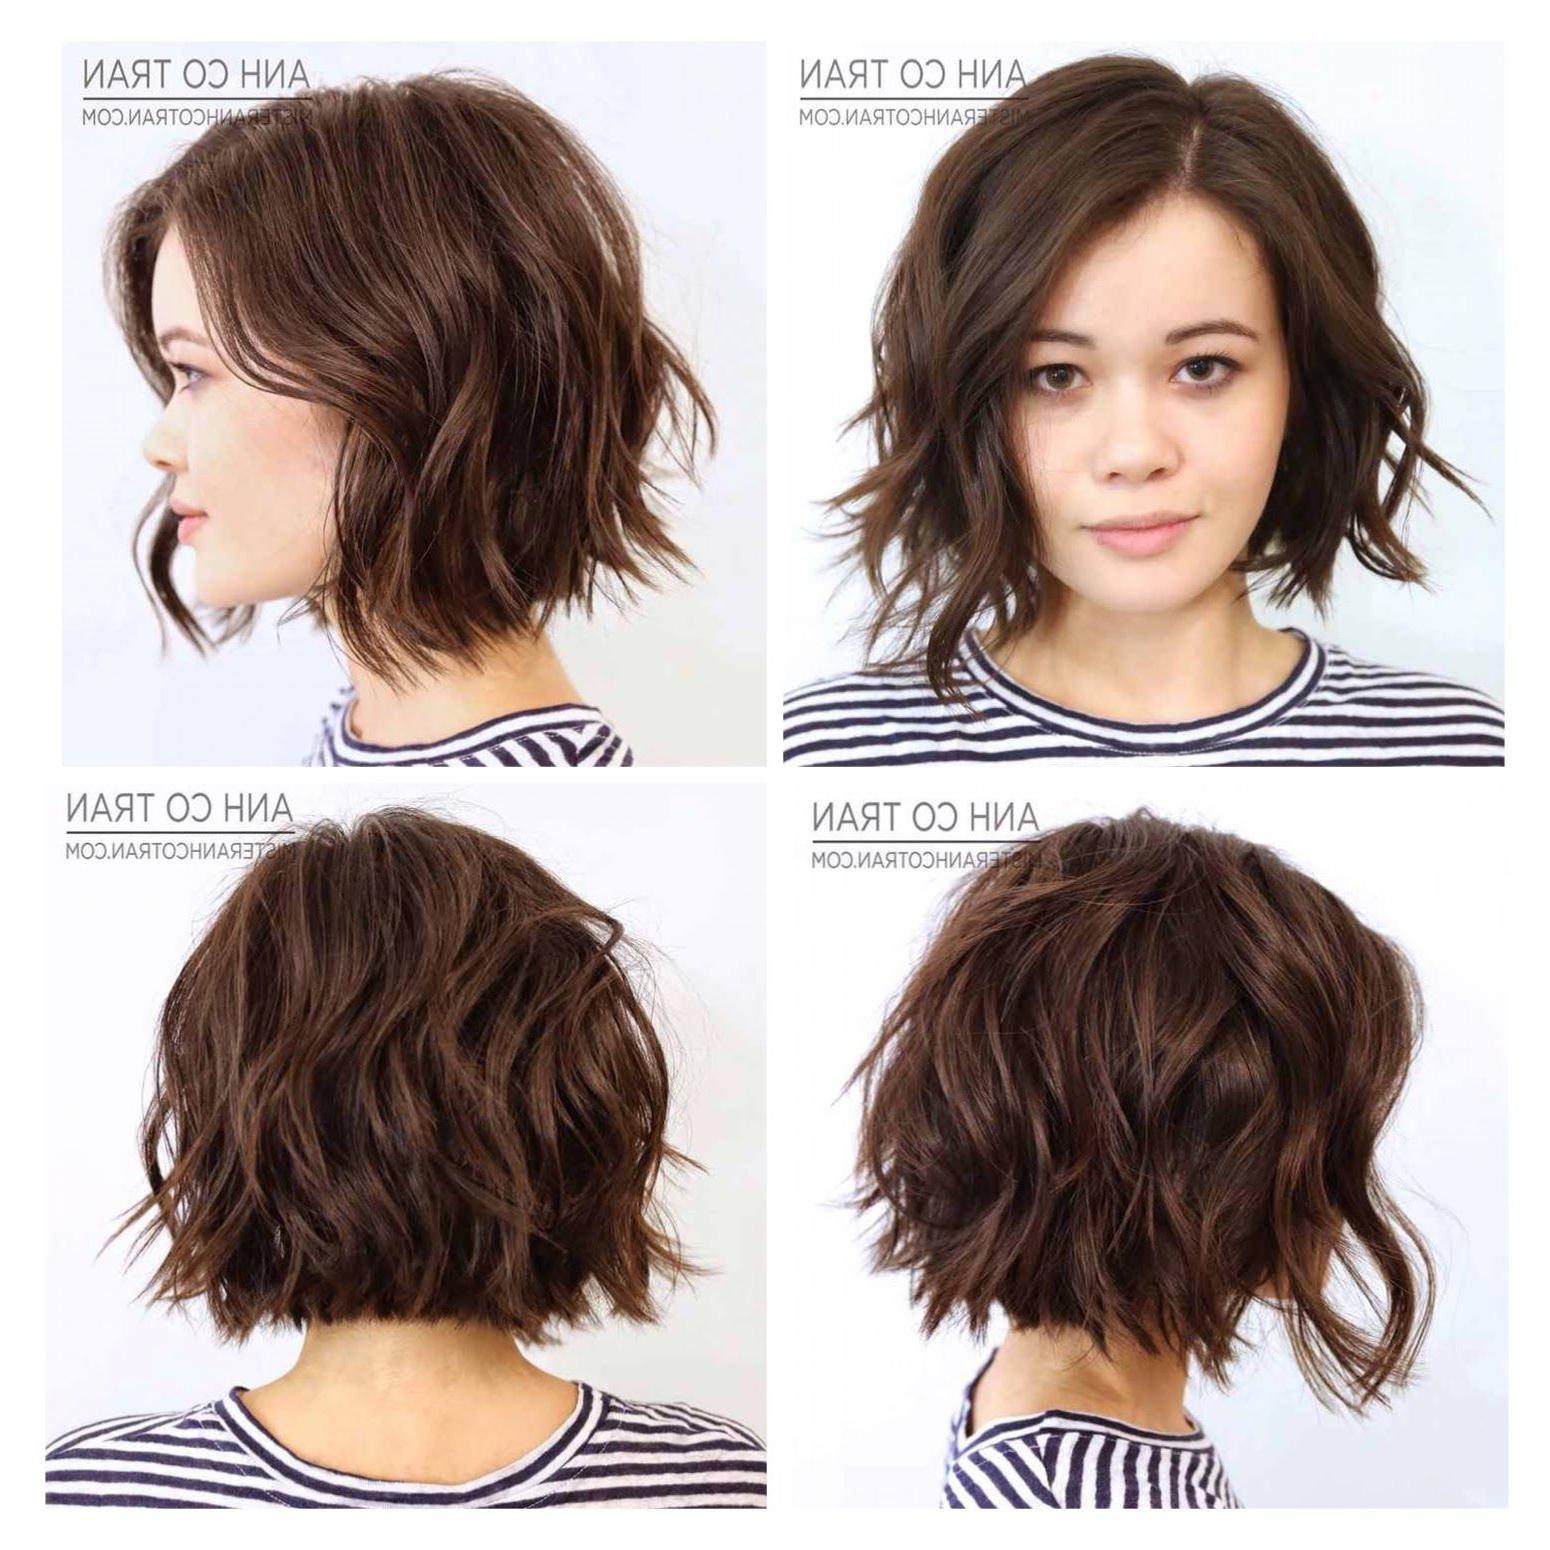 Pintara Catalano Studios On Hair | Hair, Hair Cuts, Hair For Slightly Angled Messy Bob Hairstyles (Gallery 4 of 20)